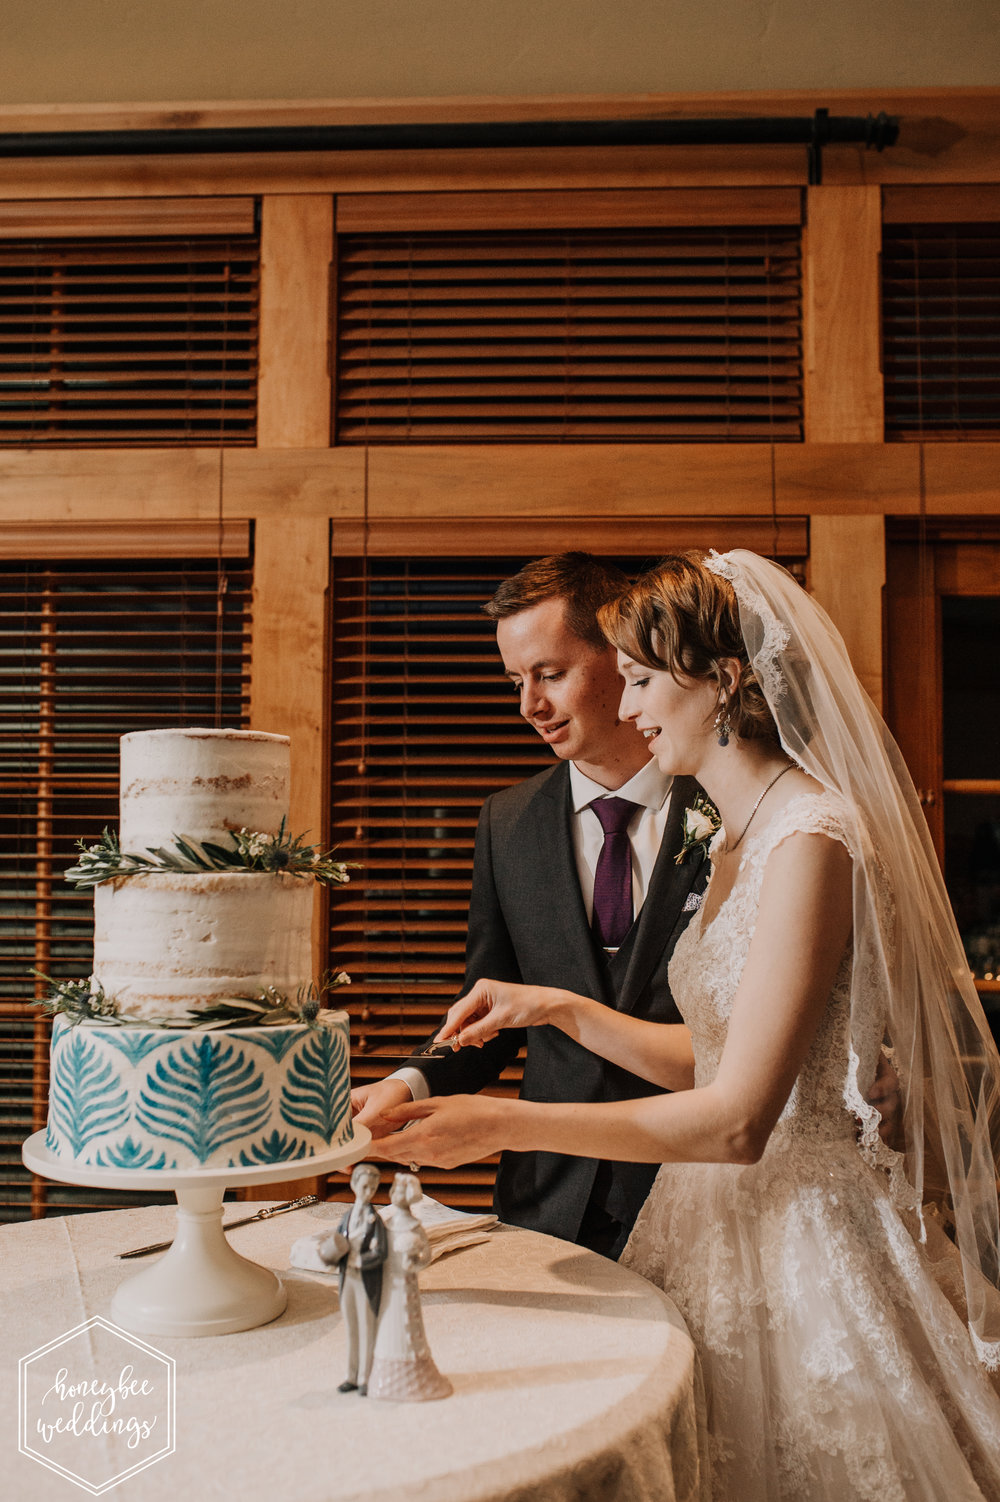 931 Riverside Country Club Wedding_Montana Wedding Photographer_Lauren Jackson + Evan Ivaldi 2018-8450.jpg